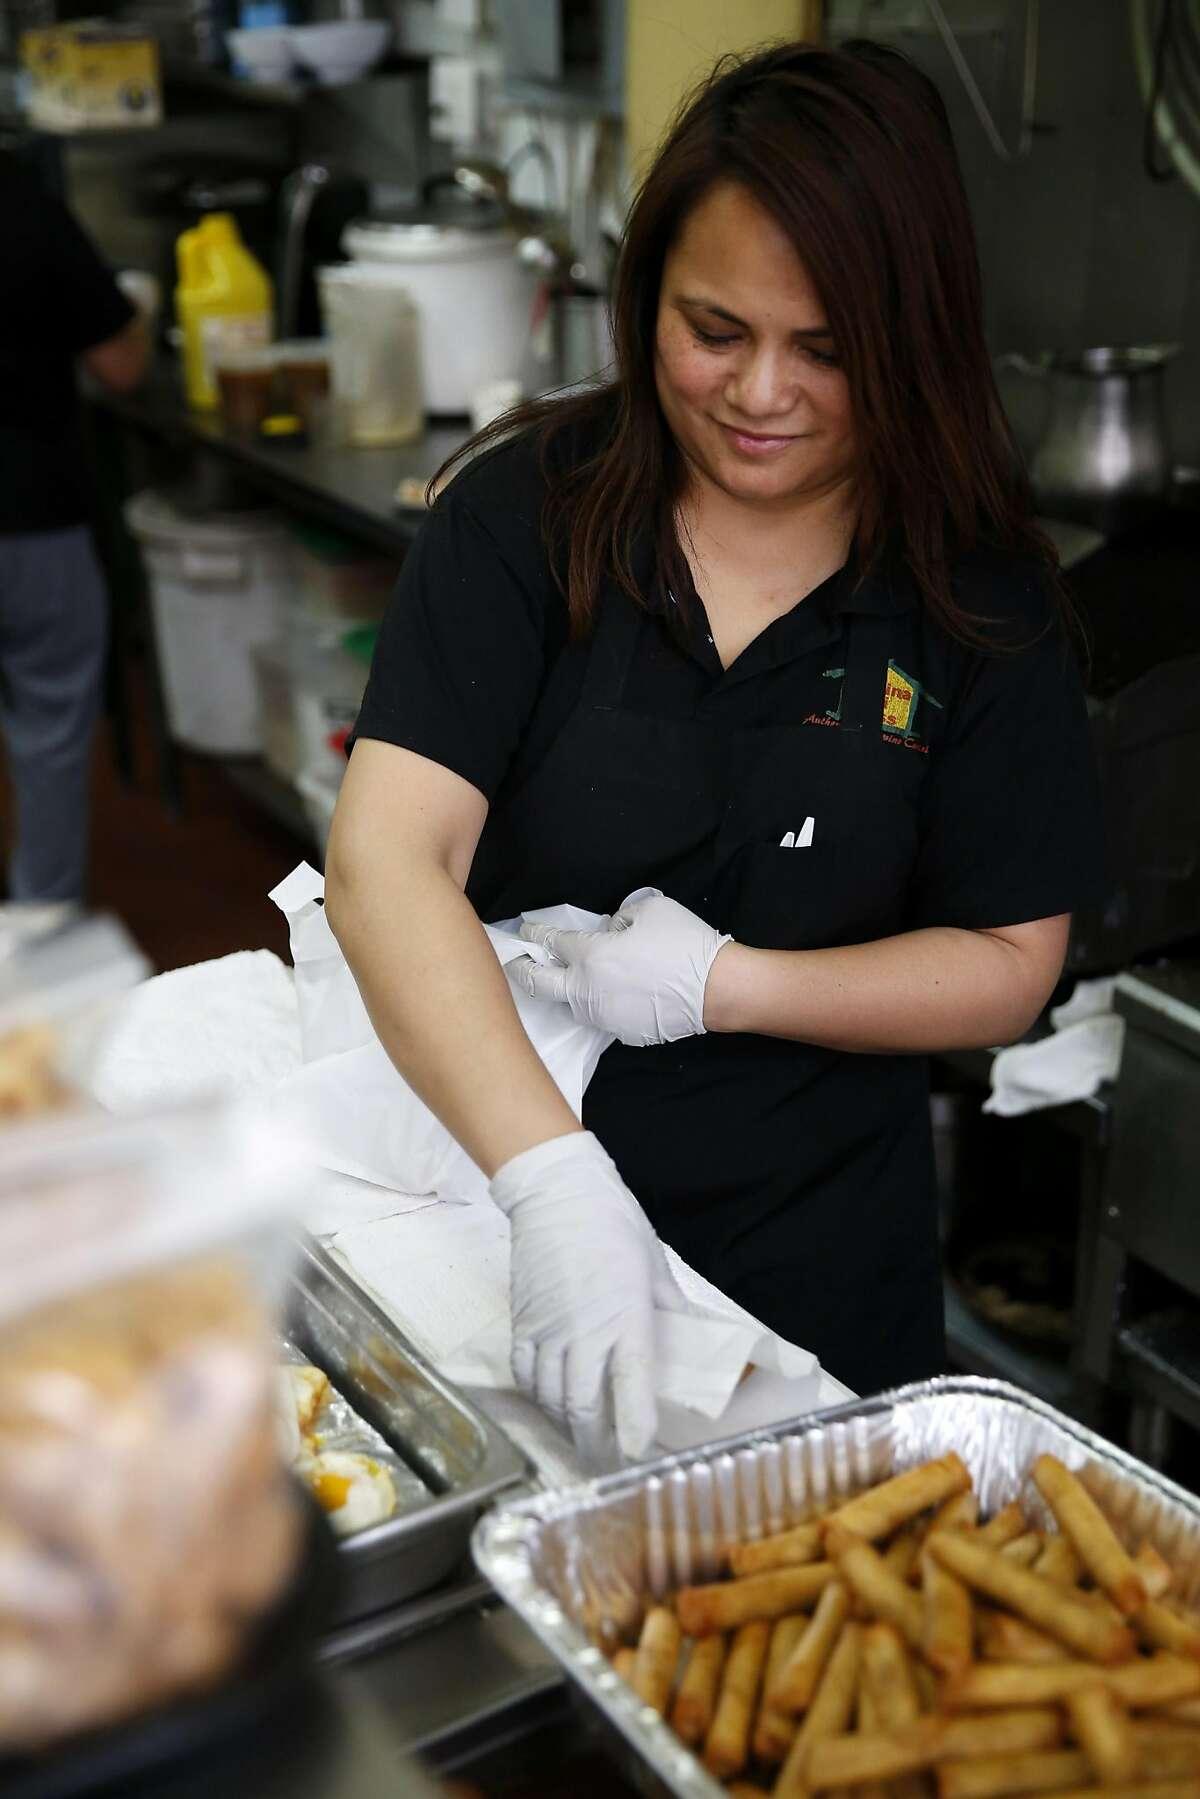 Maria San Antonio puts together a lunch order for a customer at Kusina Ni Tess in San Francisco, California, on Thursday, May 5, 2016.